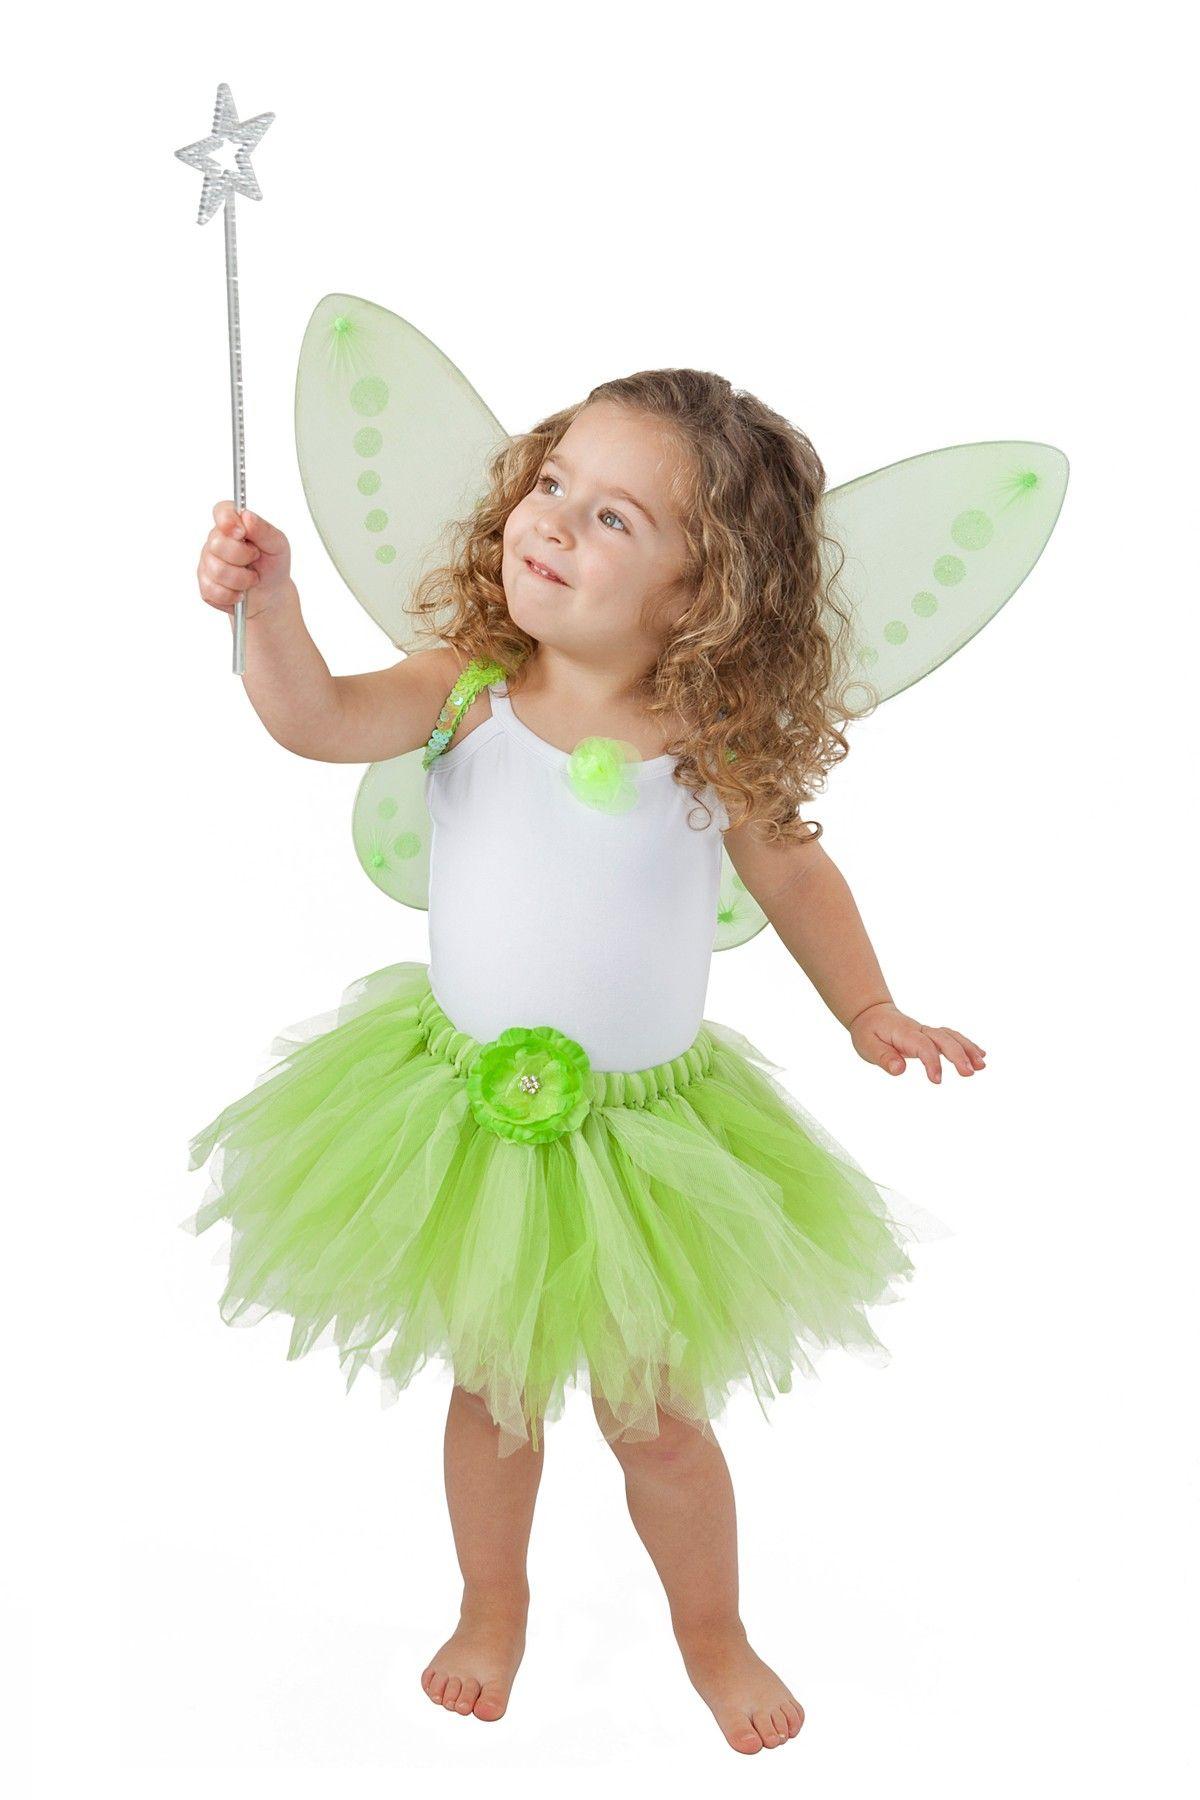 Heart To Heart Green Tinkerbell Dress Up Set Toddler Little Girls Tinker Bell Costume Toddler Costumes Tinkerbell Costume Toddler [ 1800 x 1200 Pixel ]